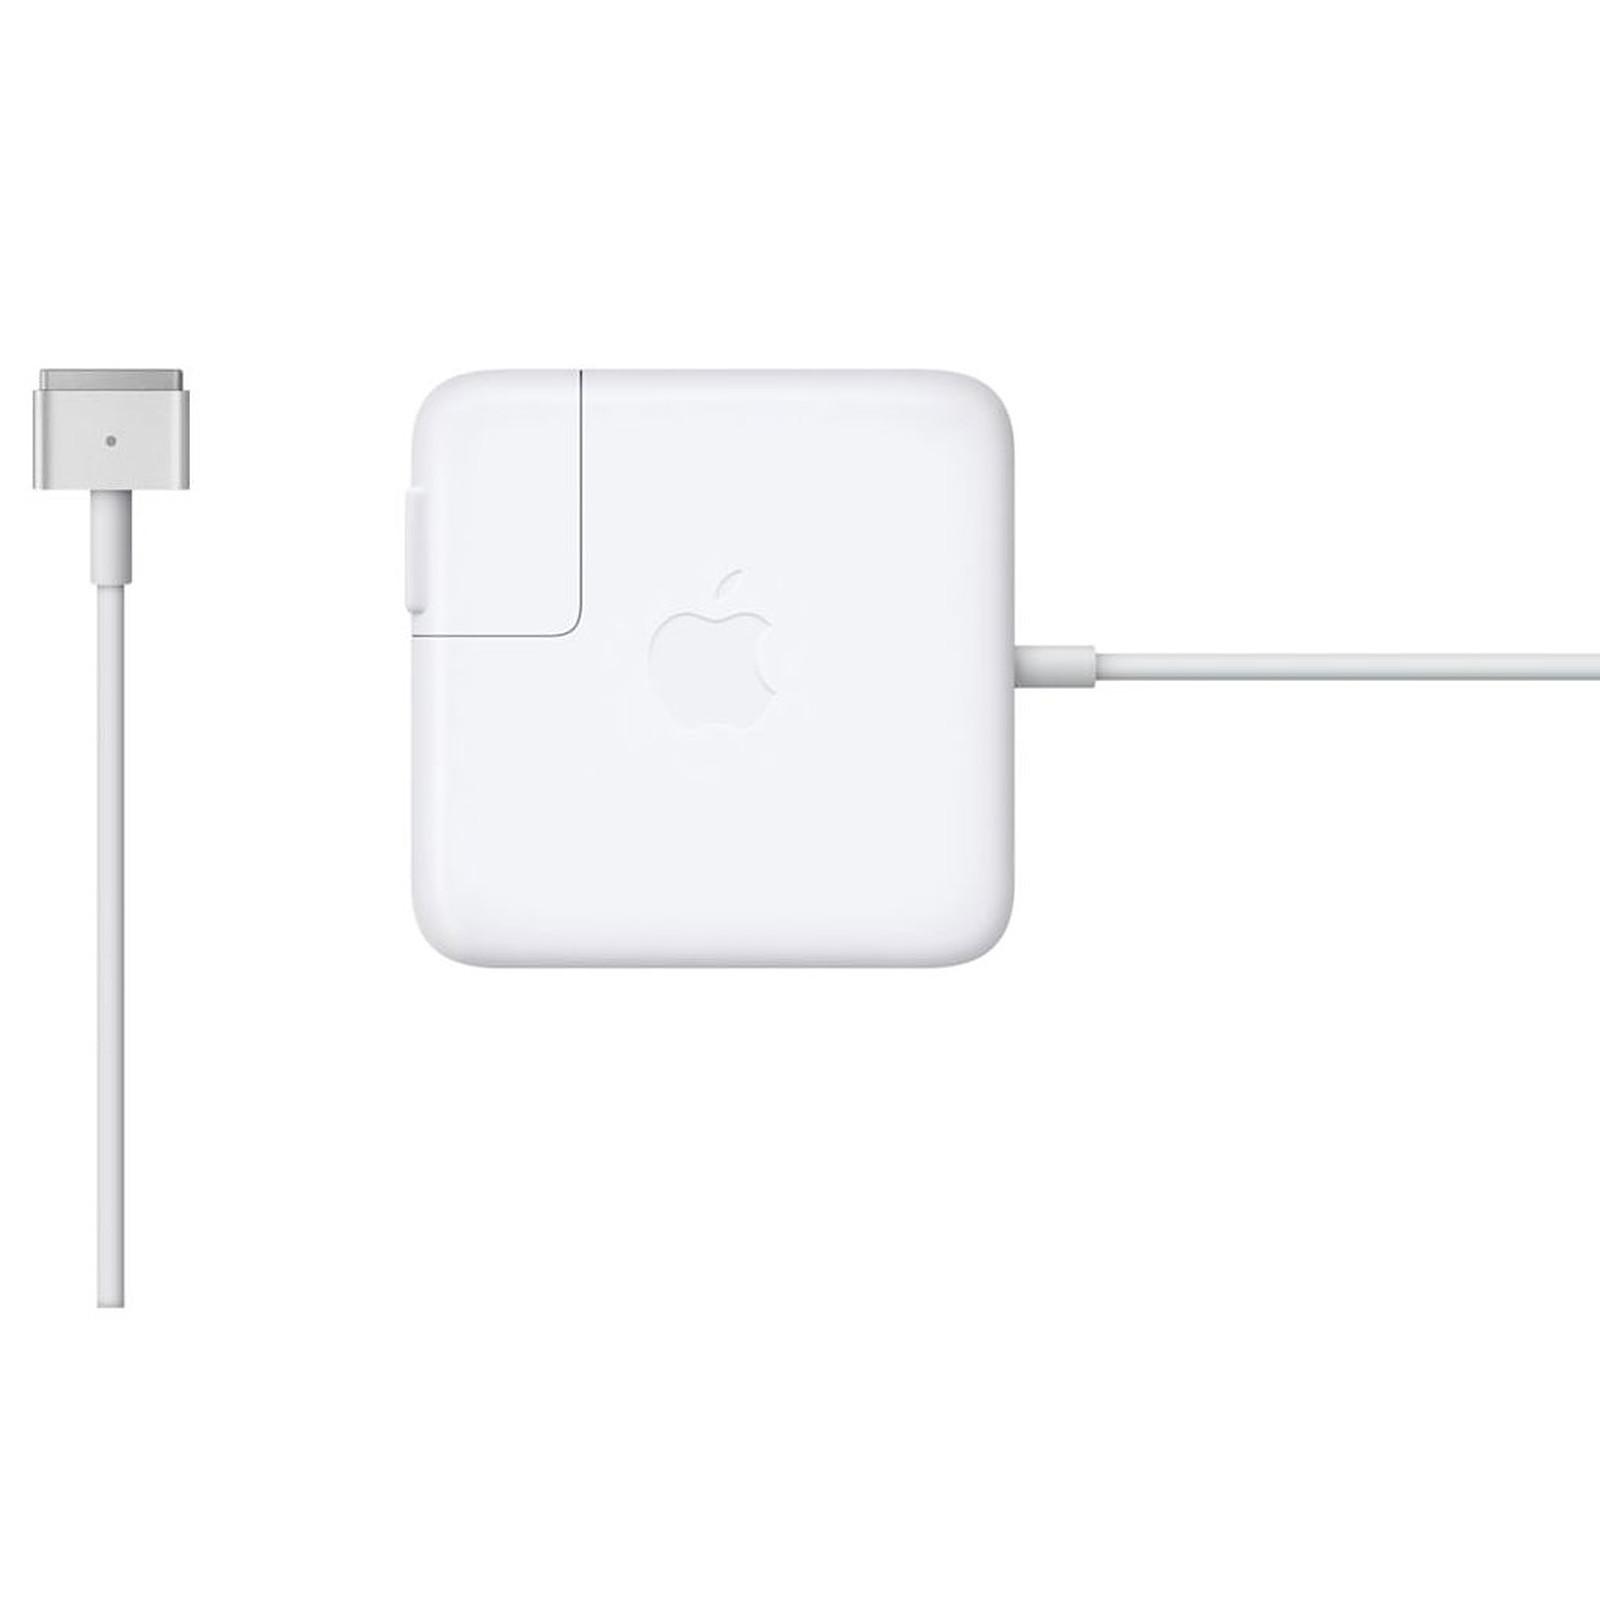 Apple Adaptateur Secteur Magsafe 2 45 W